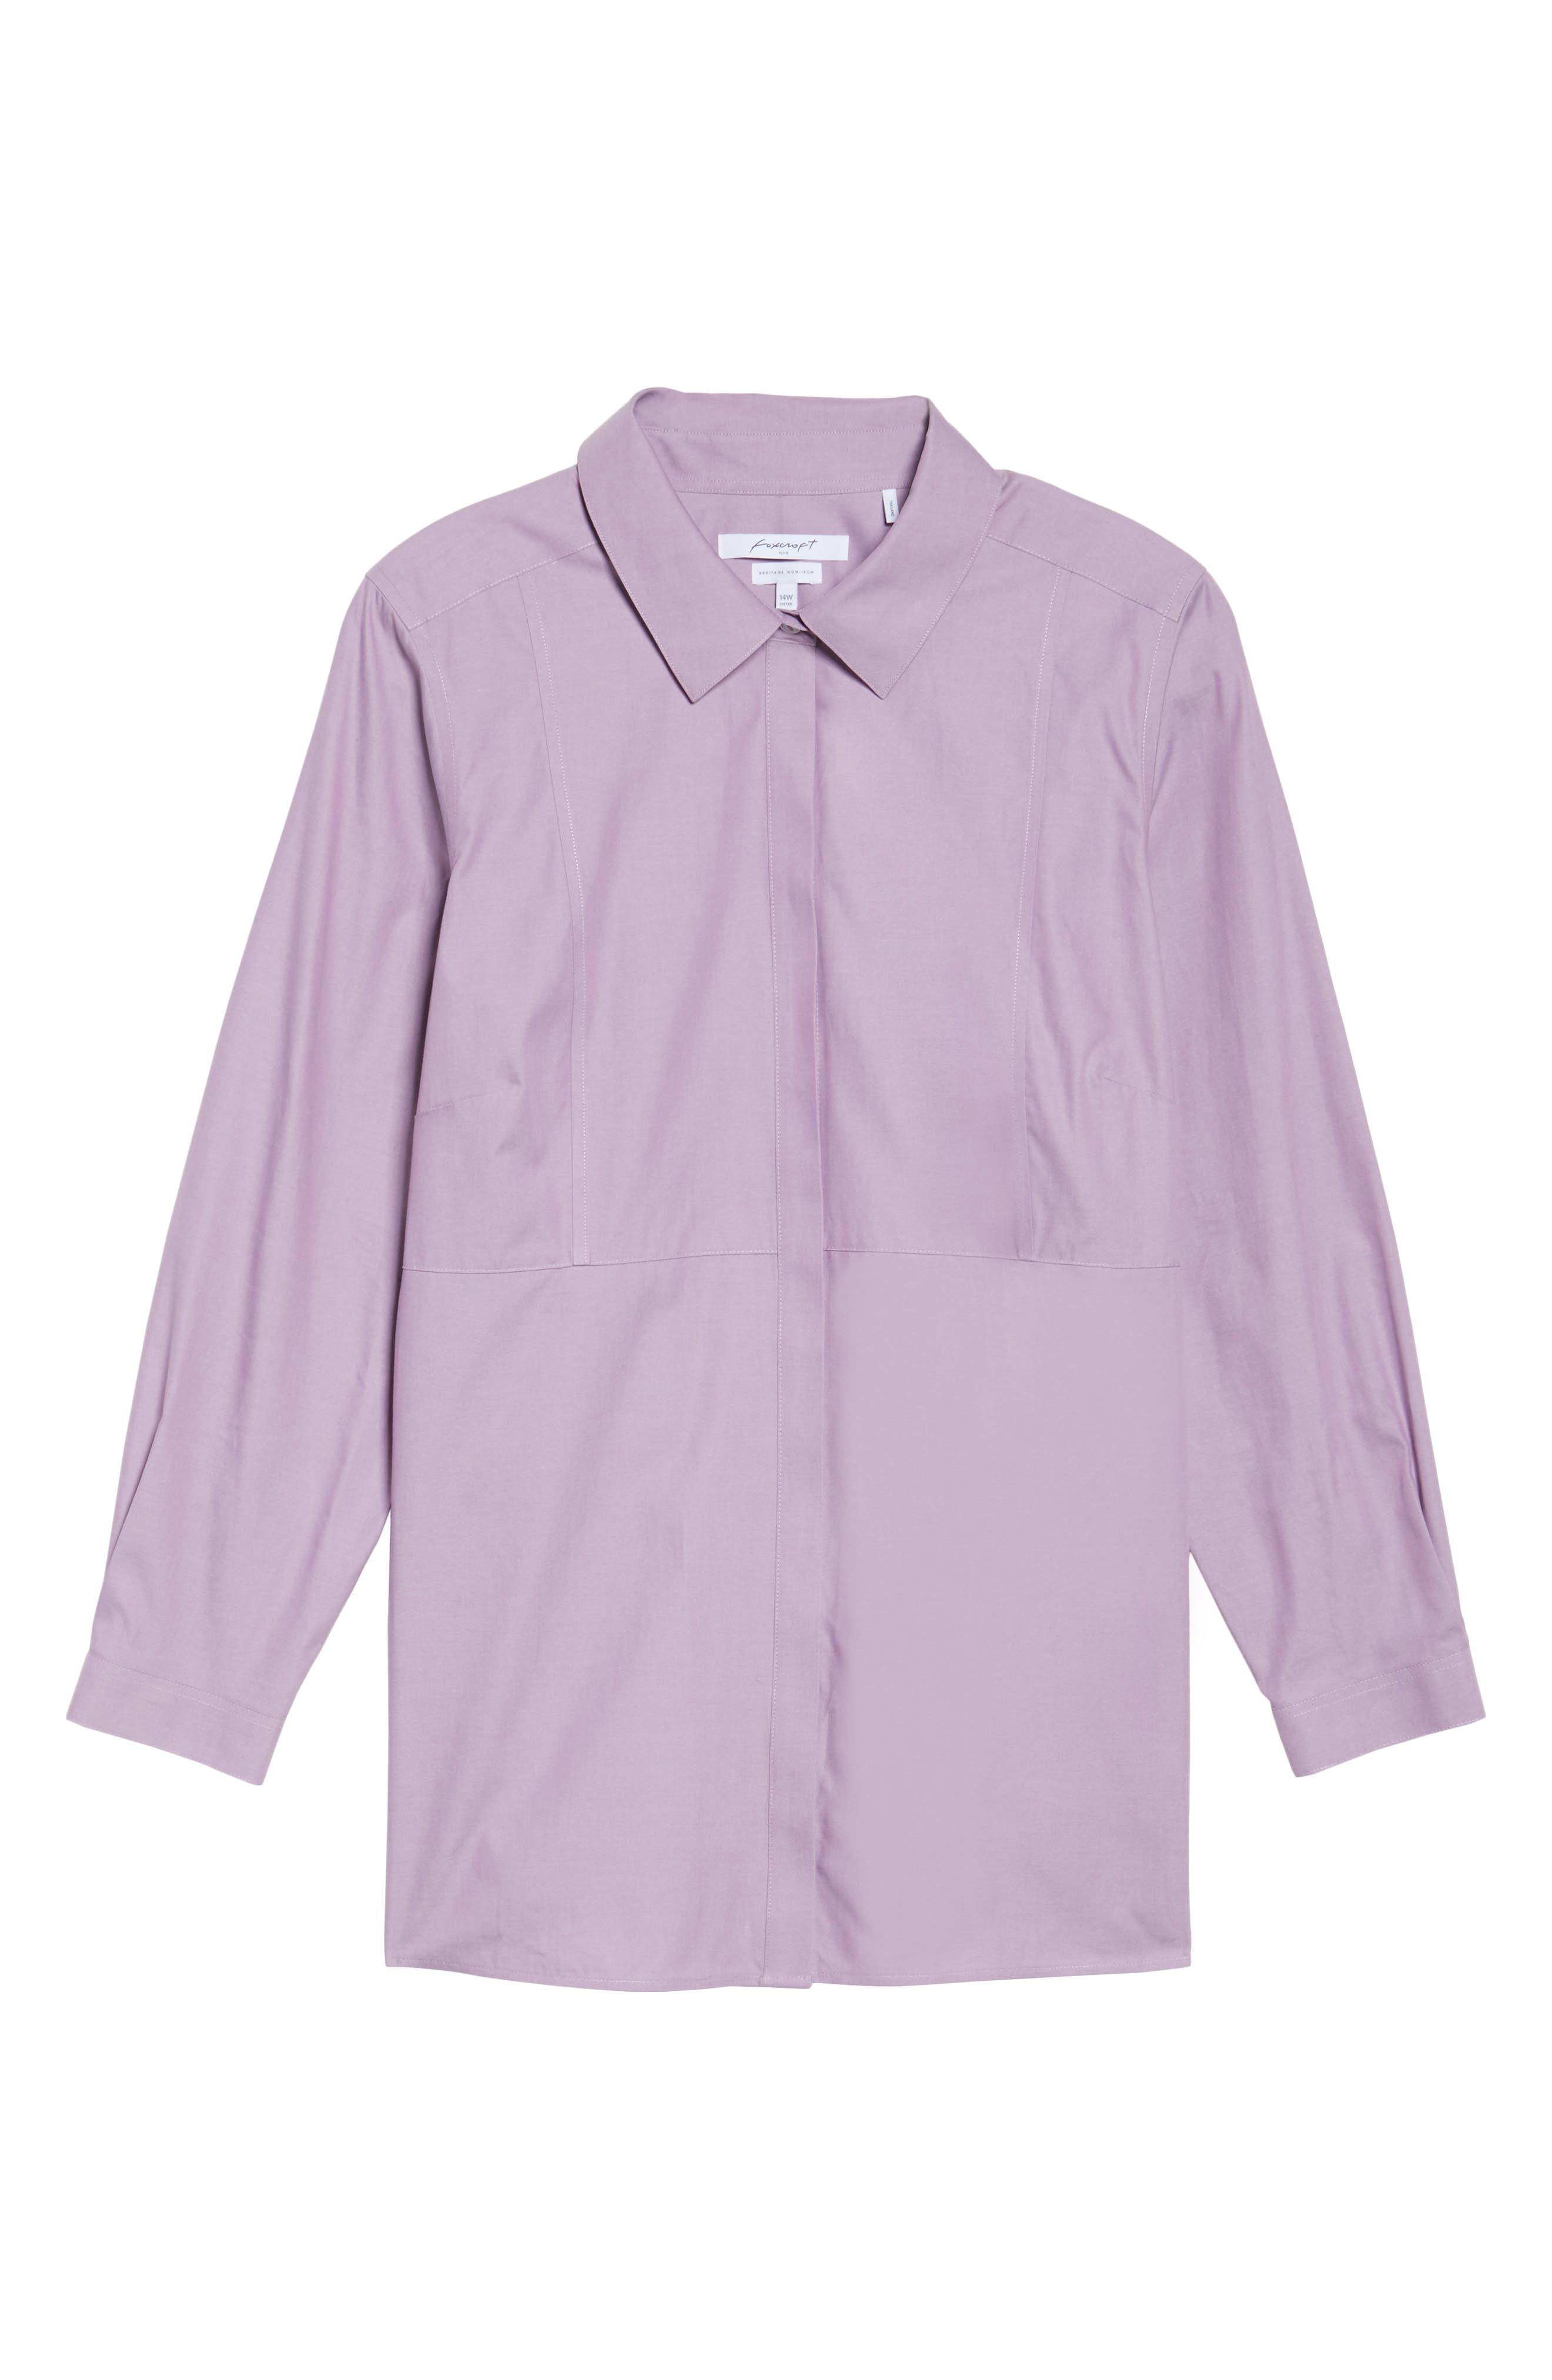 Pinpoint Oxford Cloth Shirt,                             Alternate thumbnail 17, color,